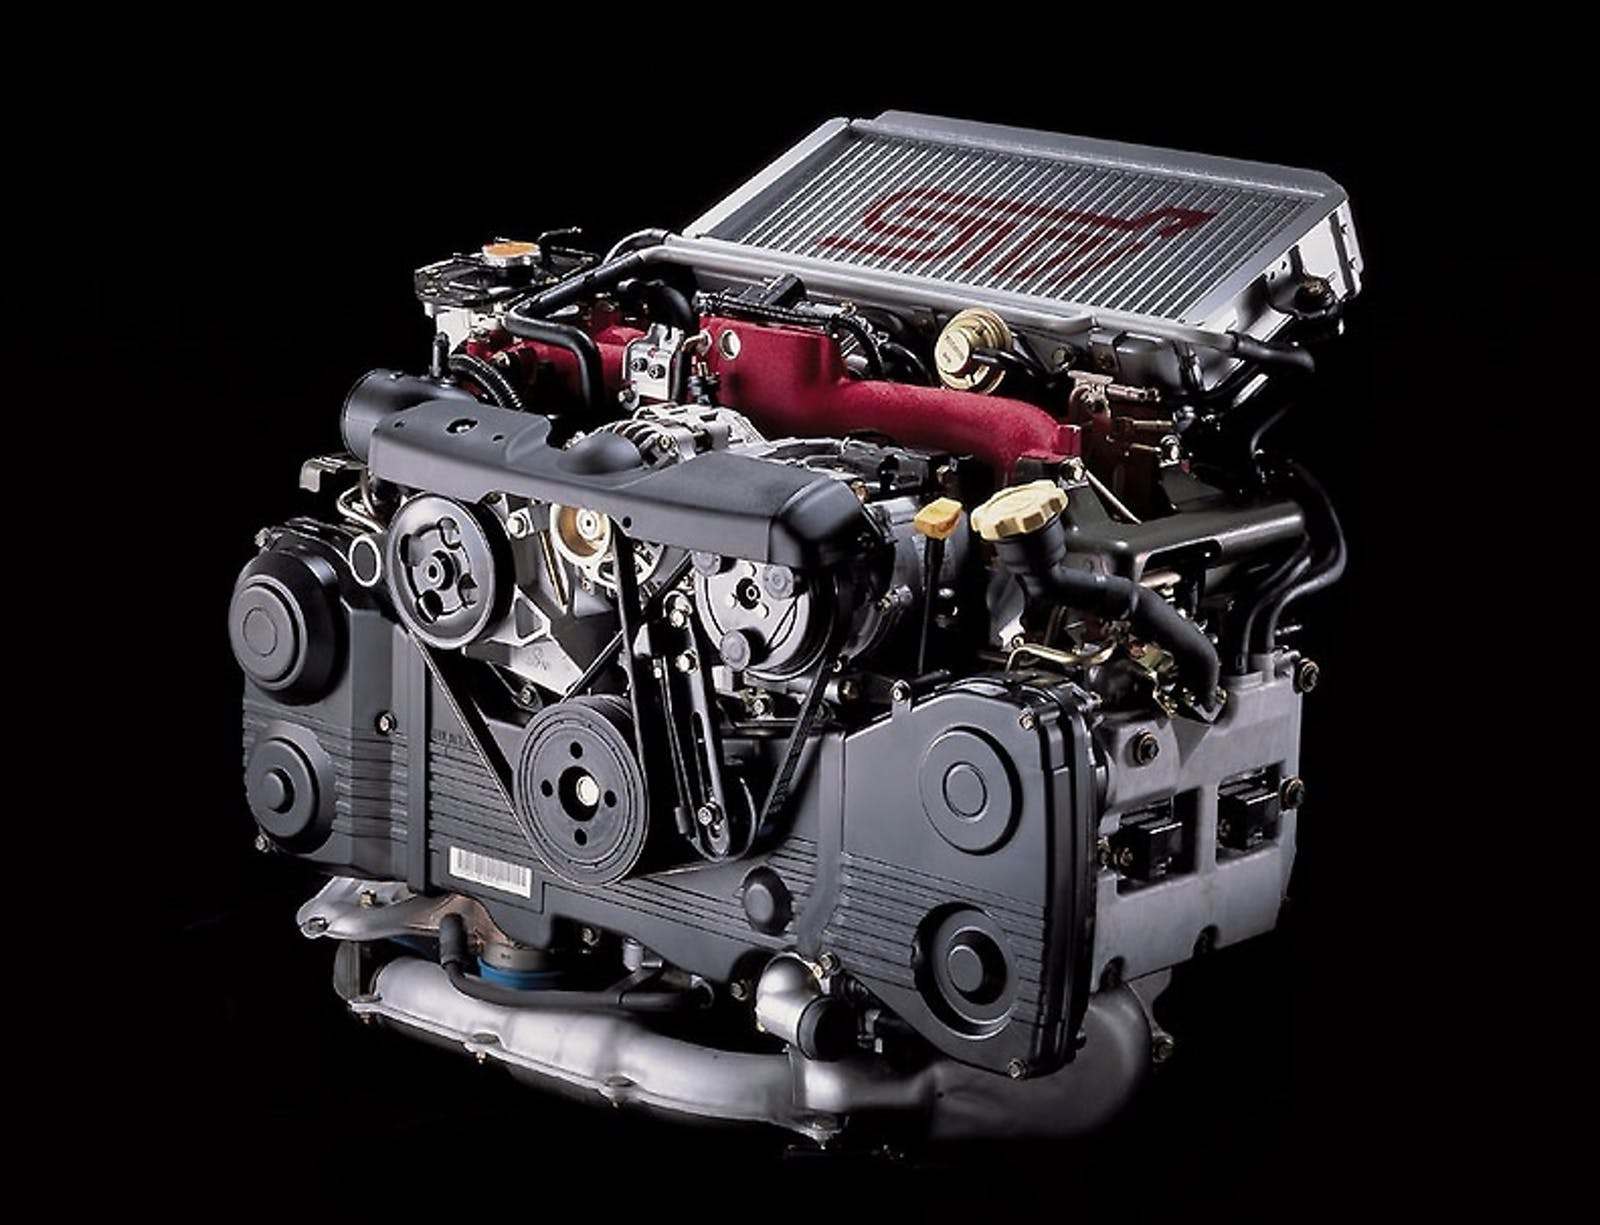 Subaru JDM engines are cool.